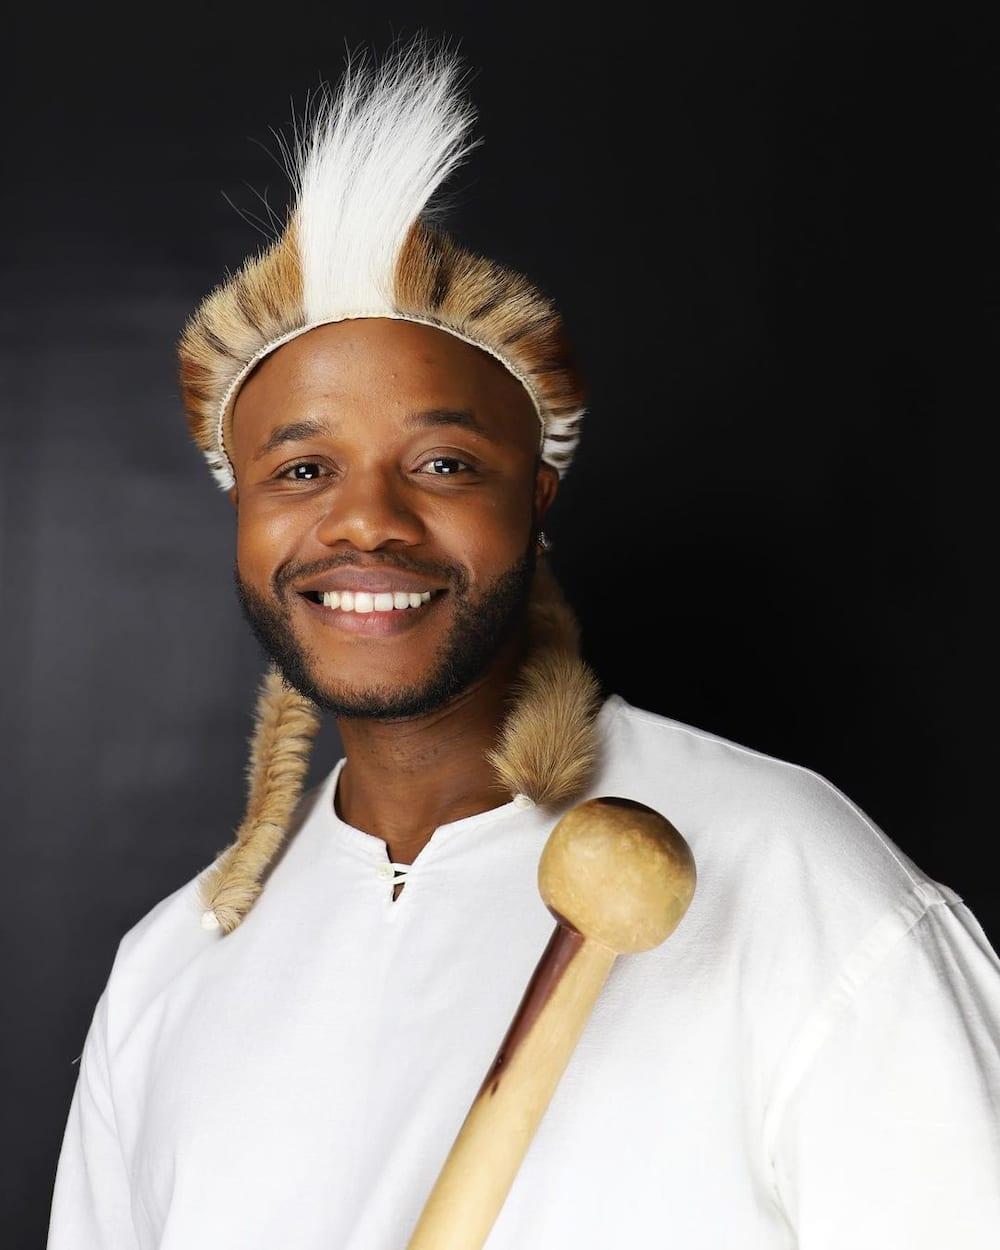 Mzansi Magic Unmarried series